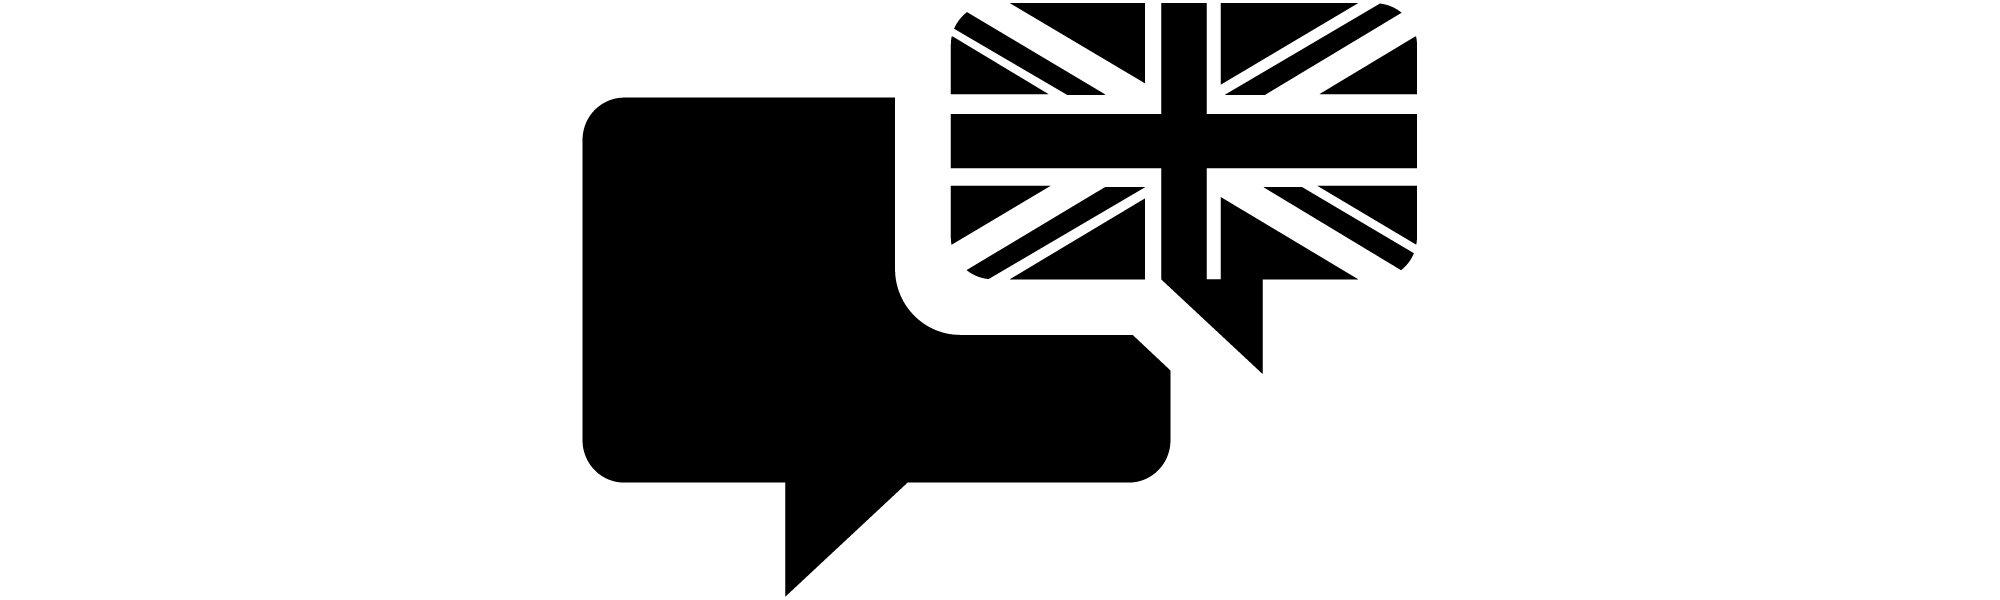 Verpassen Englisch